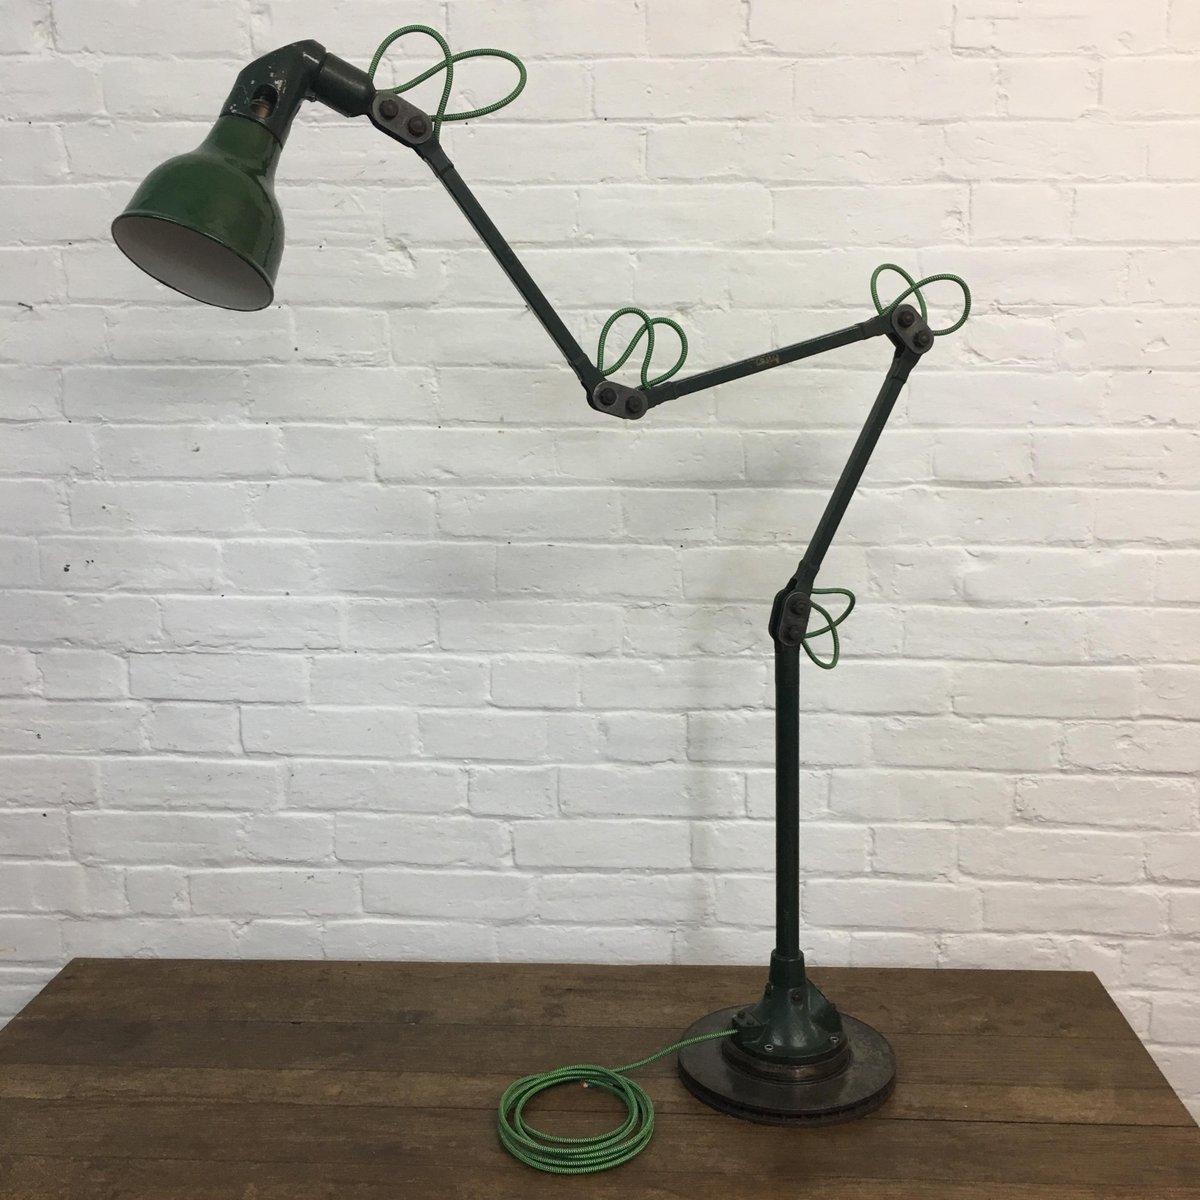 4-Armige Vintage Fabriklampe von Mek Elek